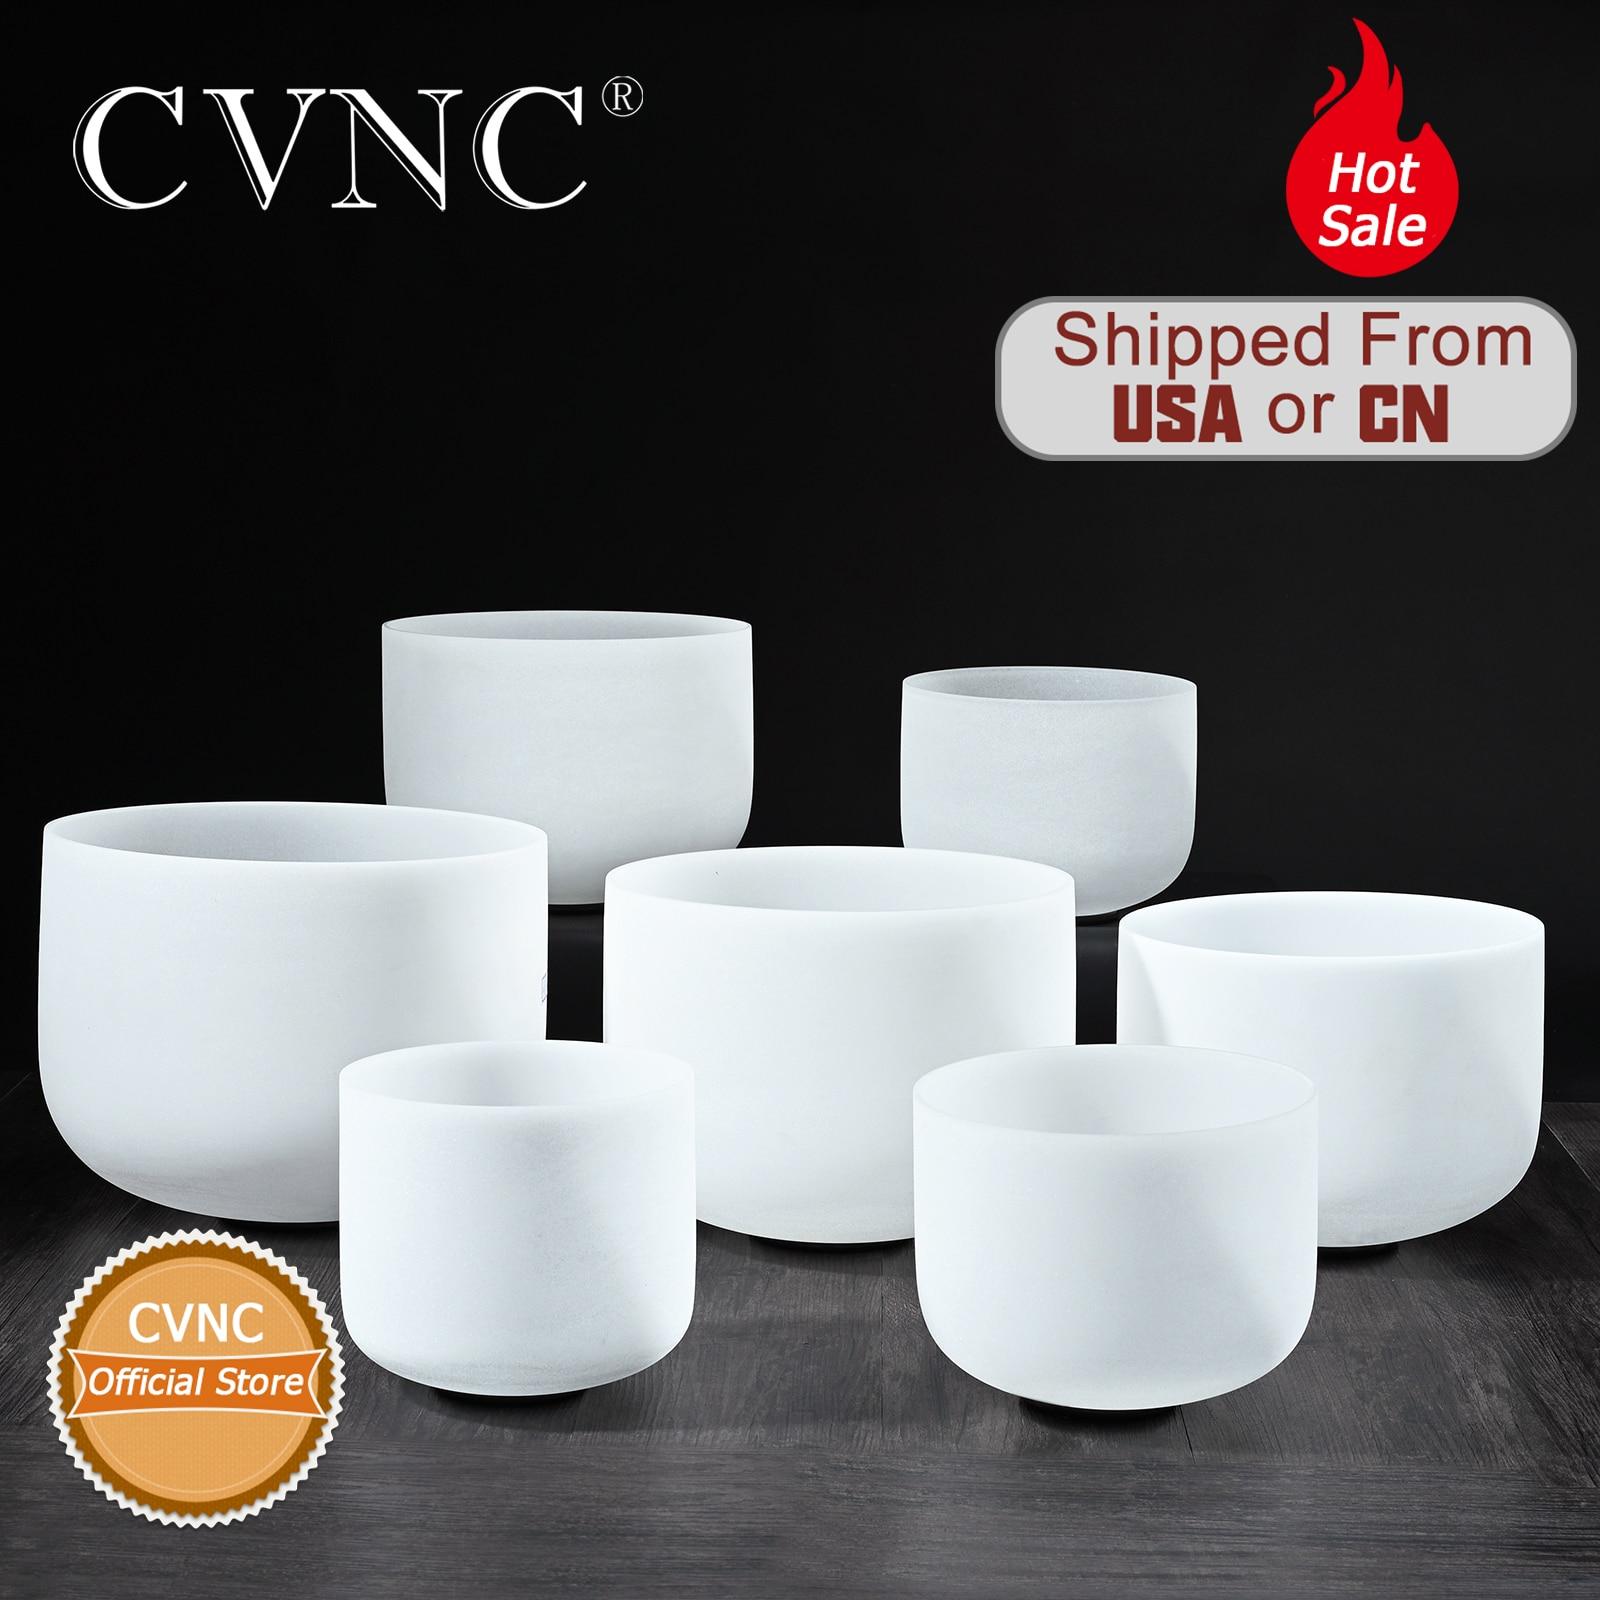 "CVNC Christmas Gifts  6""-12"" Note CDEFGAB Set Of  7PCS Chakra  Frosted Quartz Crystal Singing Bowl"